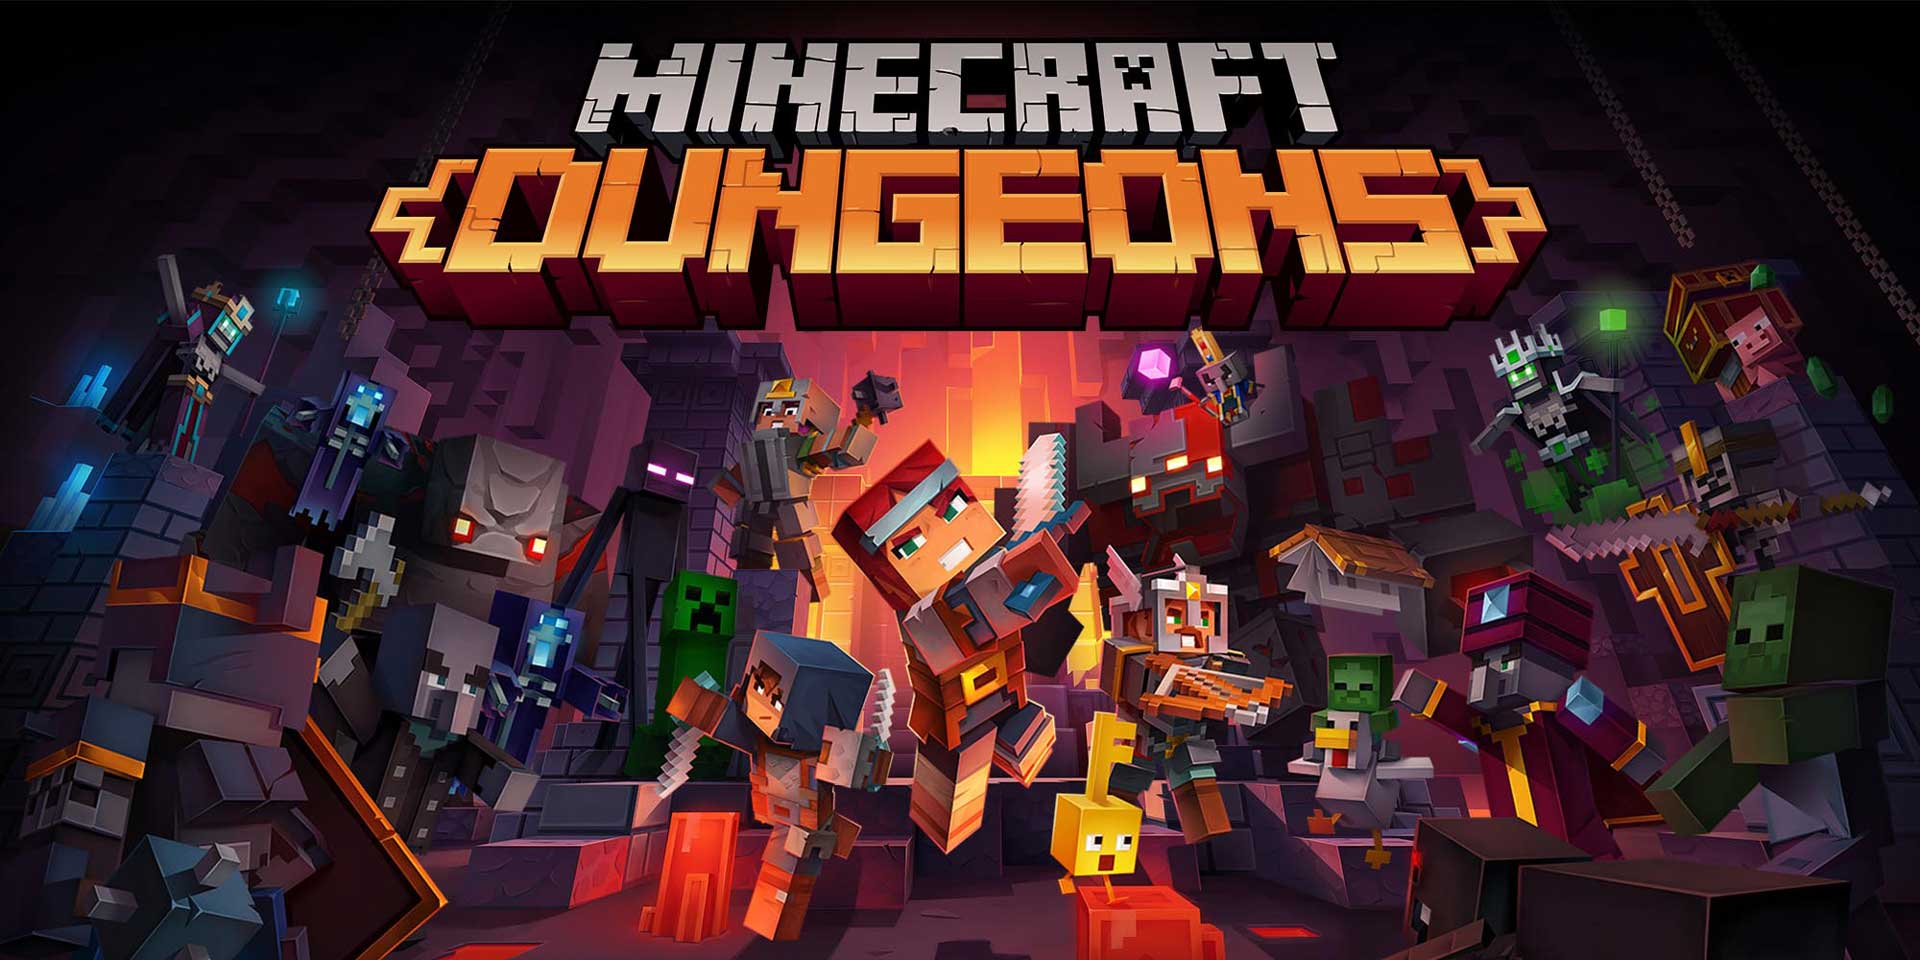 59 200326 NSW NintendoSwitch MinecraftDungeons KeyArt